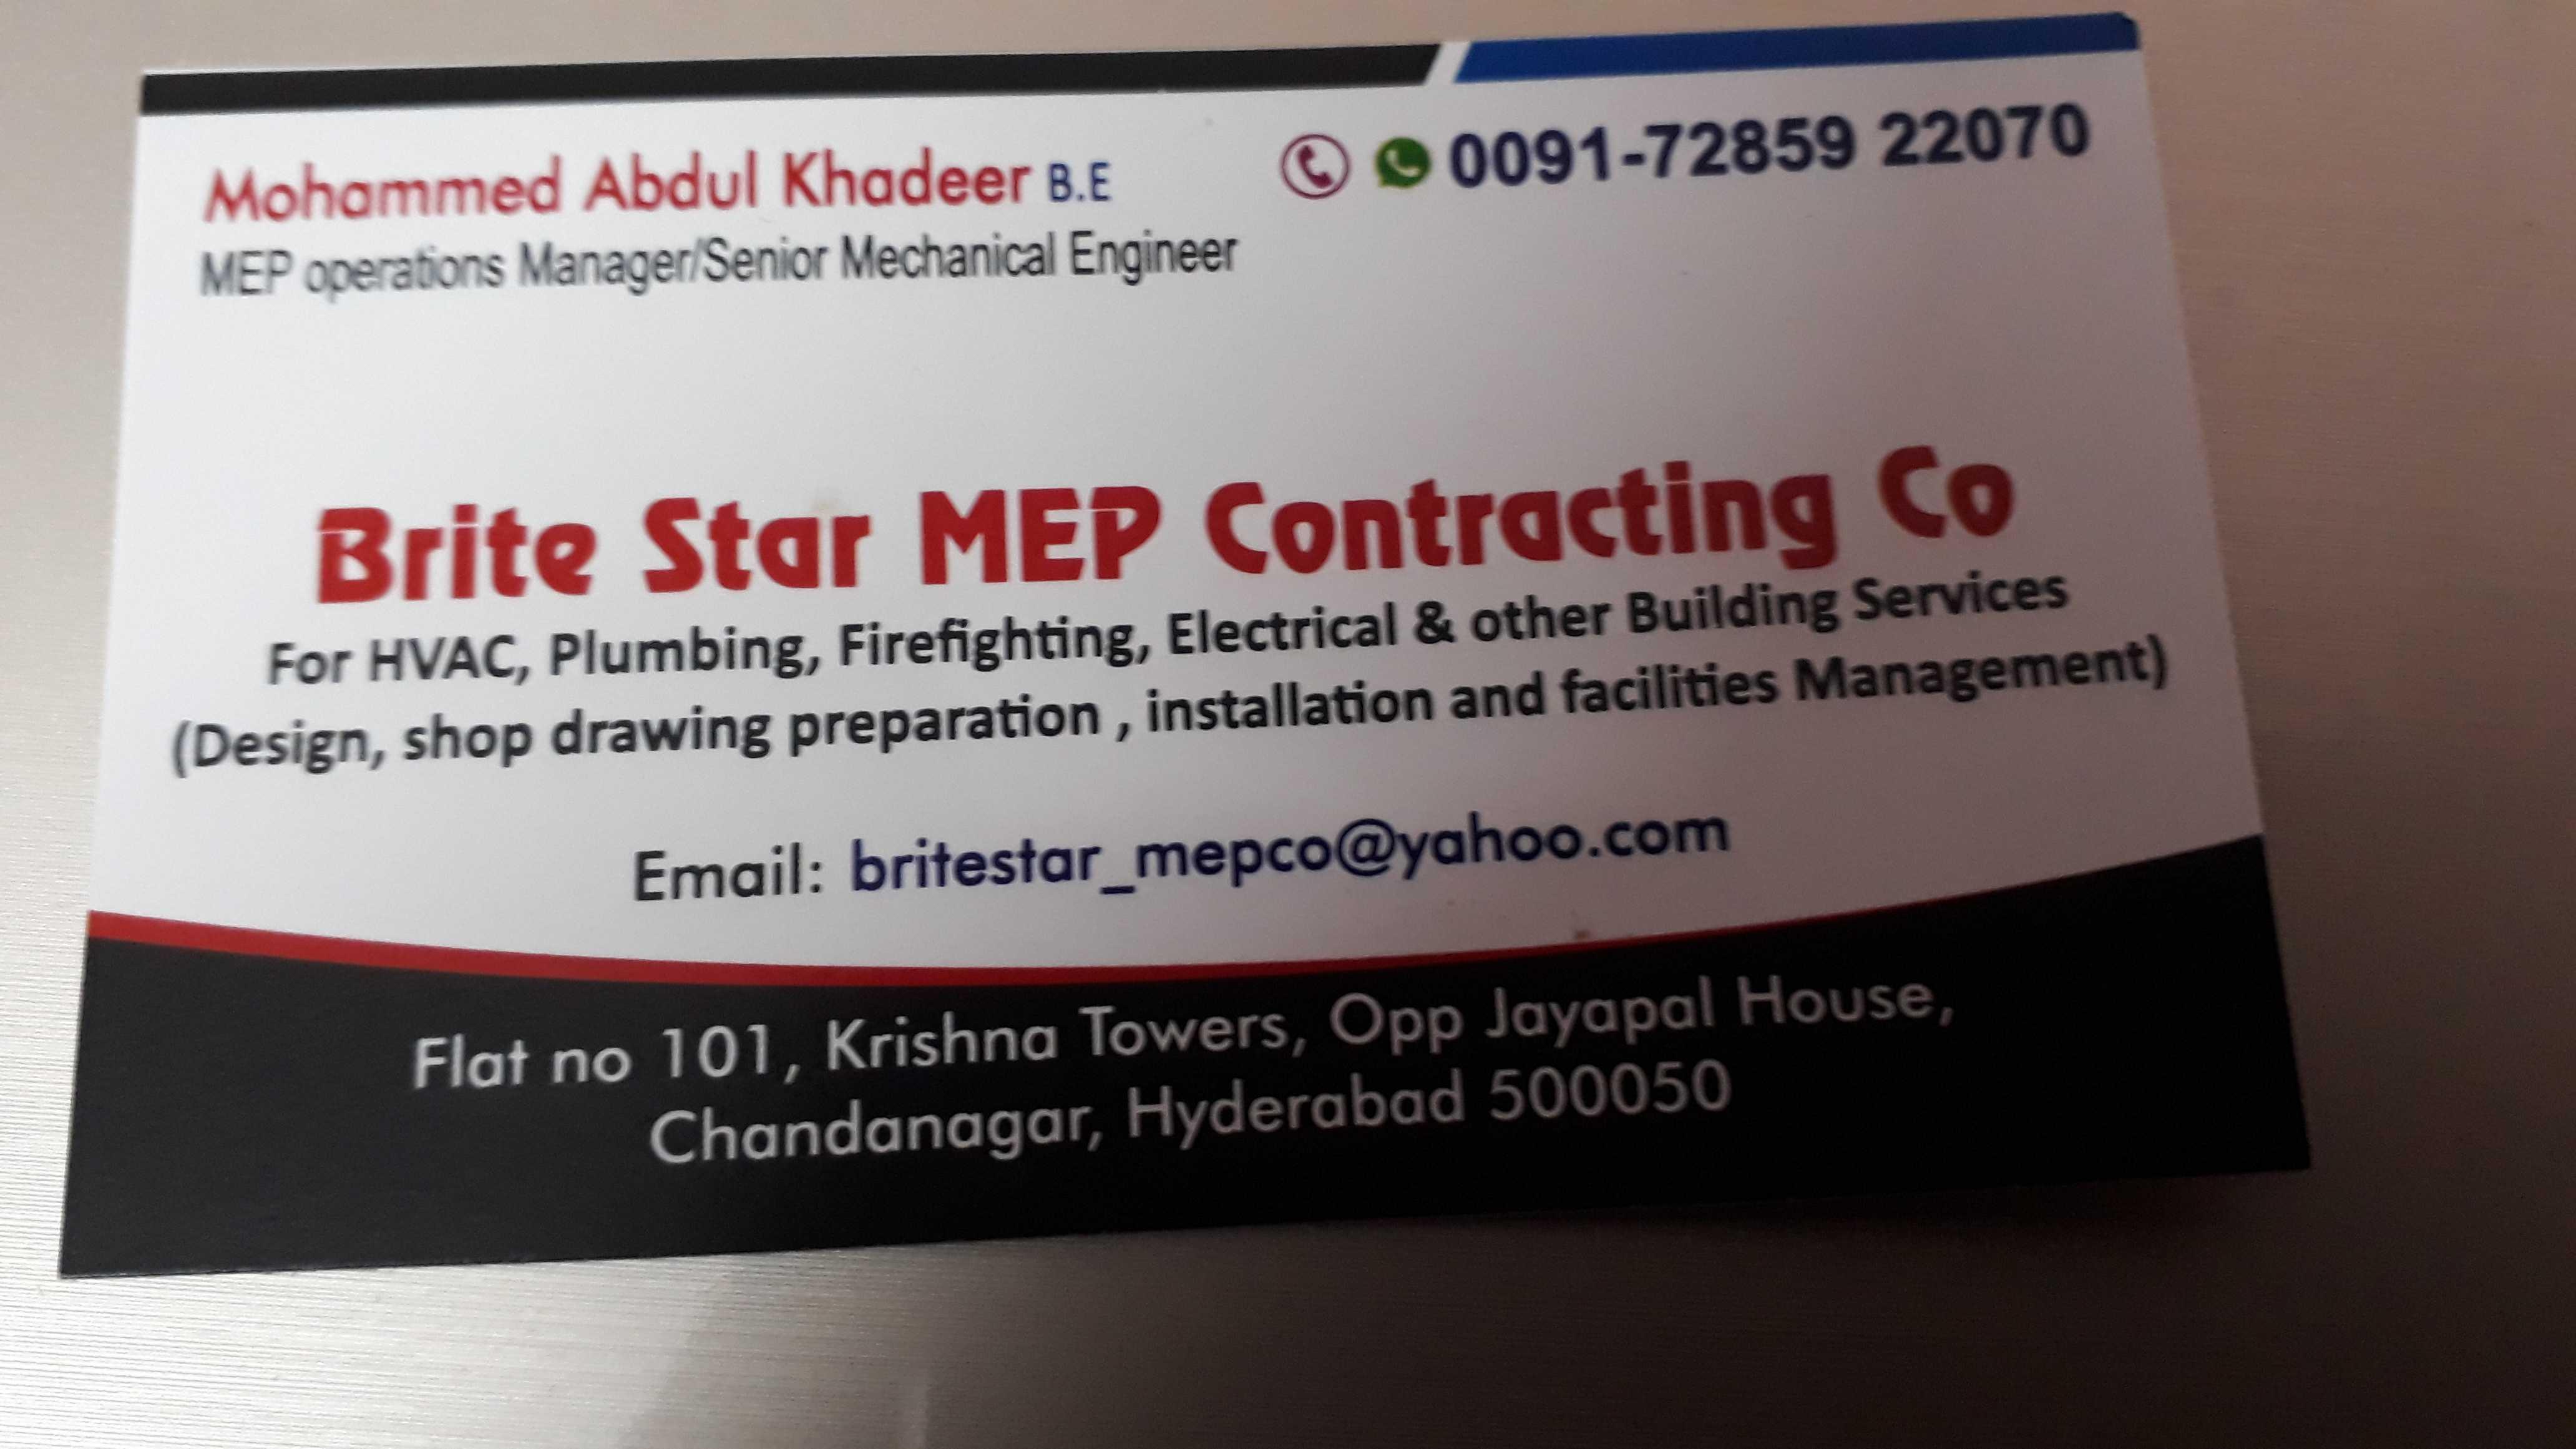 Brite Star MEP Contracting Co in Chanda Nagar, Hyderabad-500050